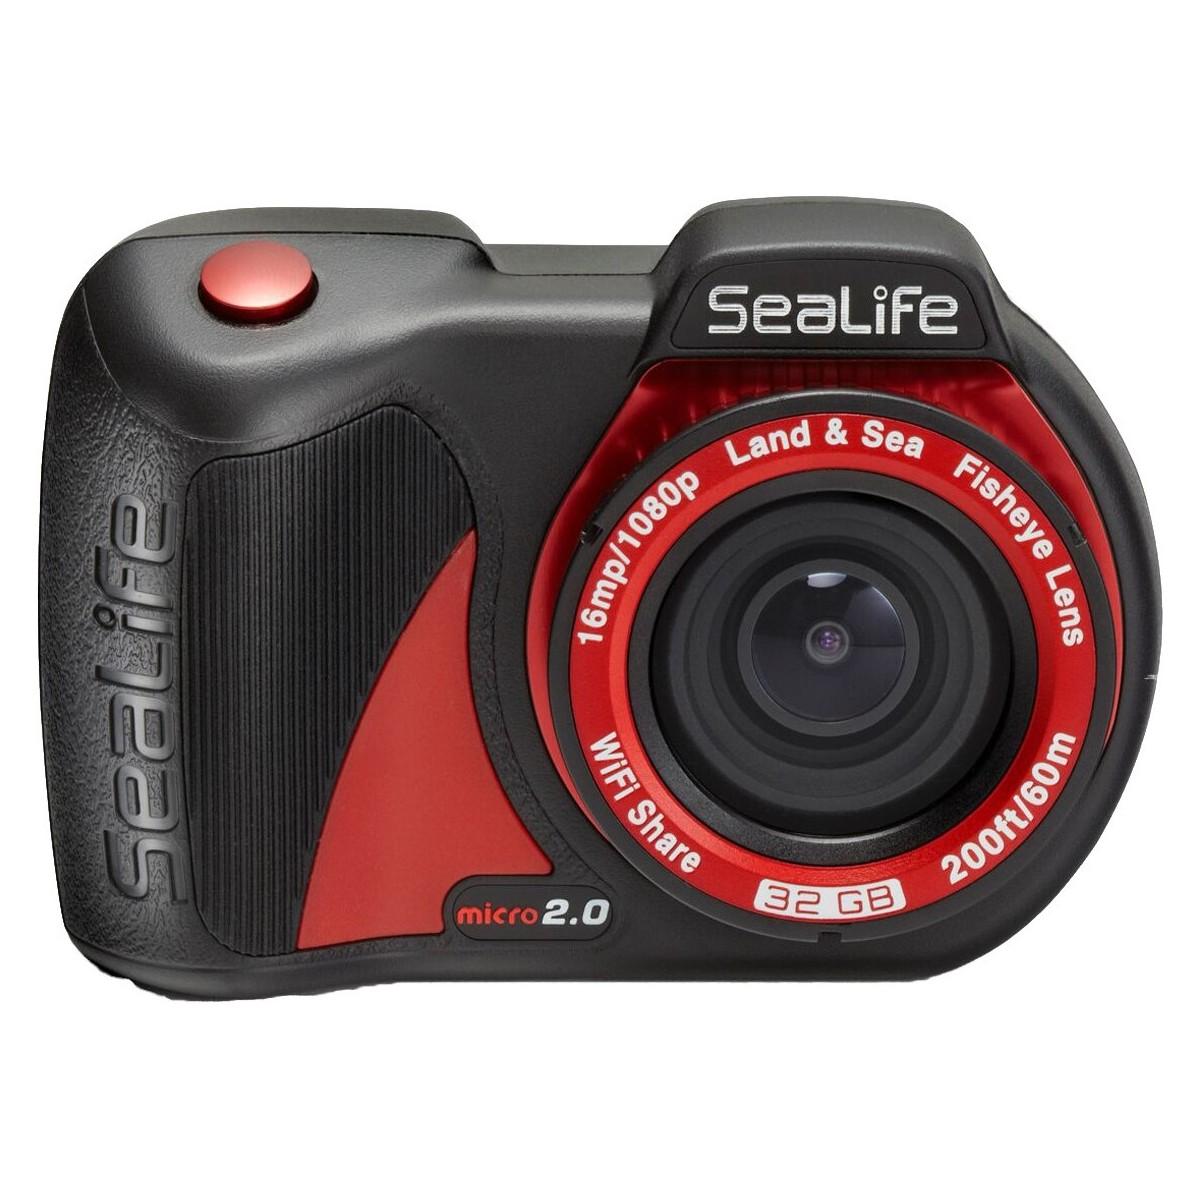 Sealife Micro 2.0 16mp WiFi Underwater Camera 32GB